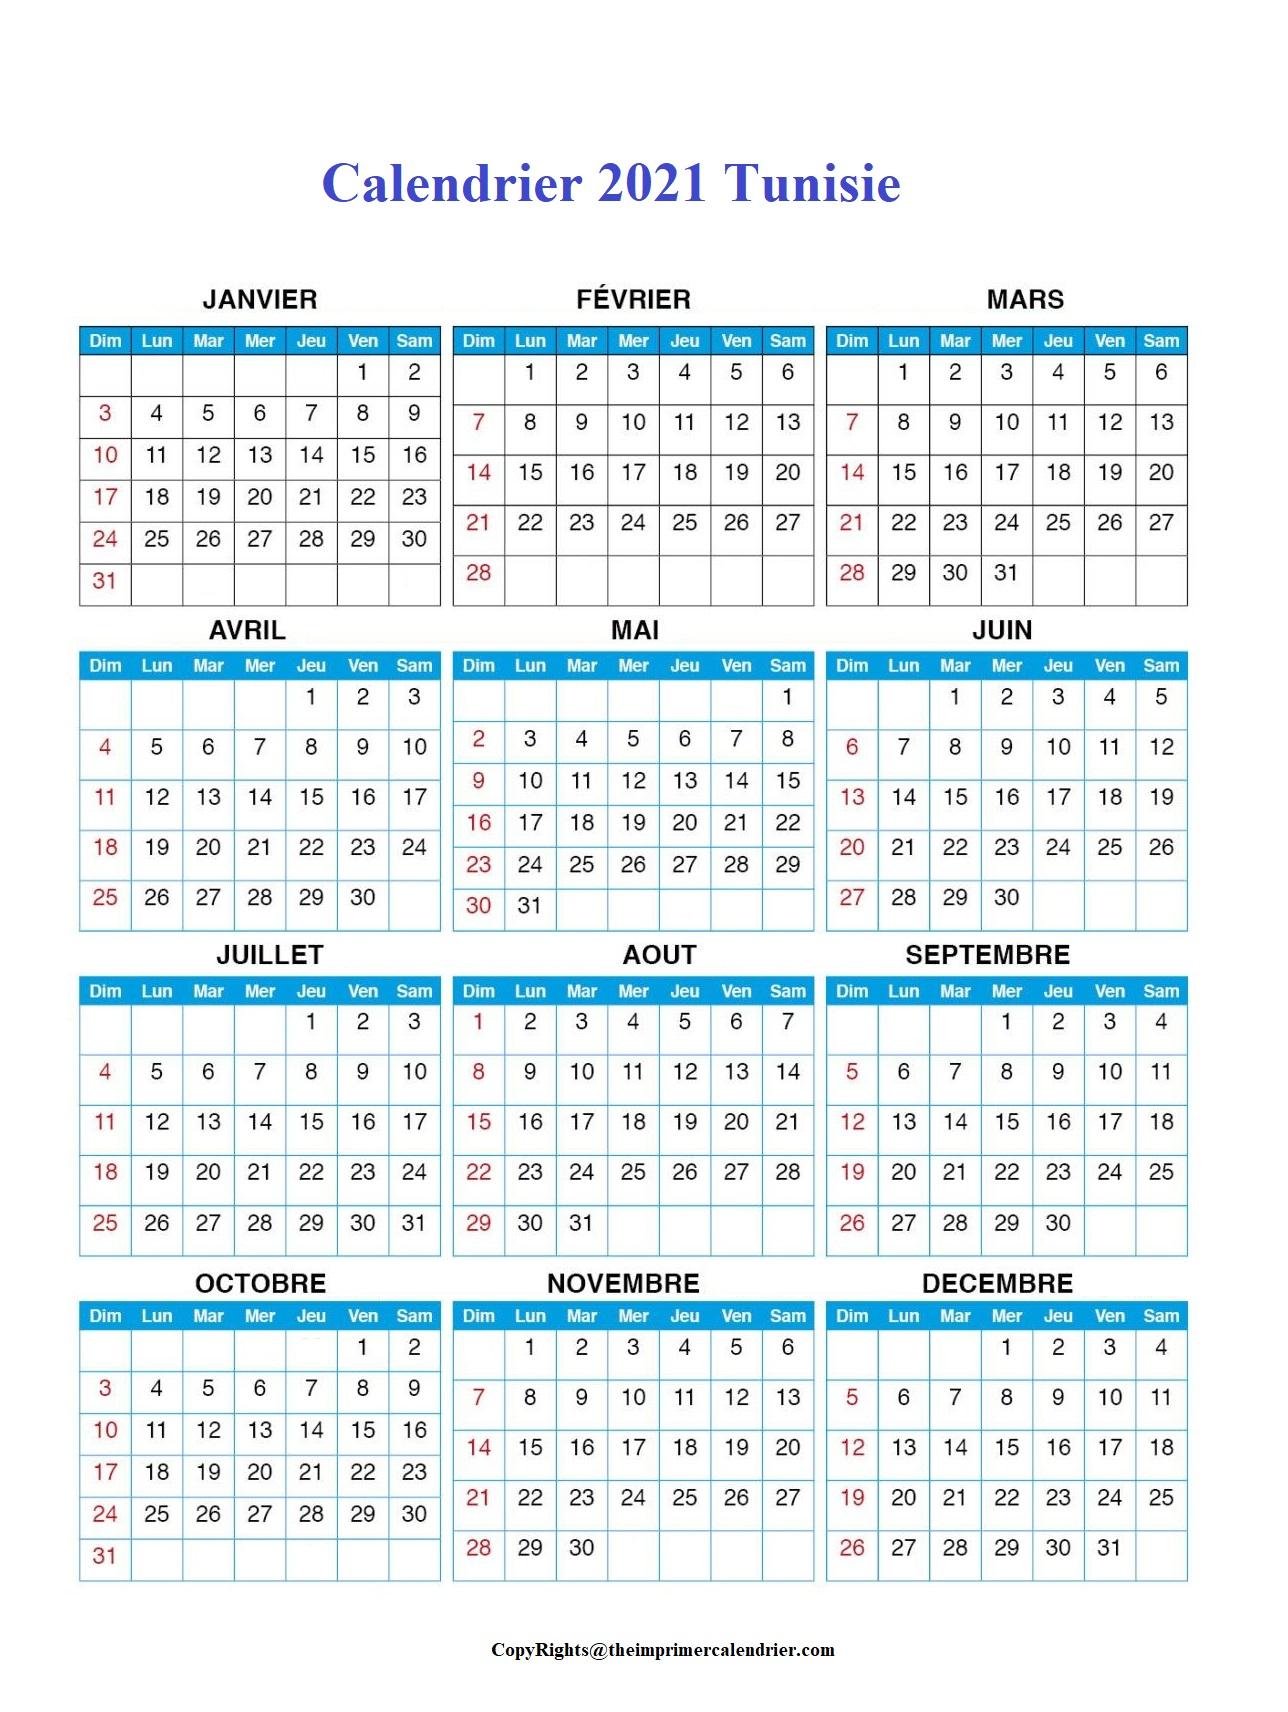 Calendrier 2021 Tunisie Excel